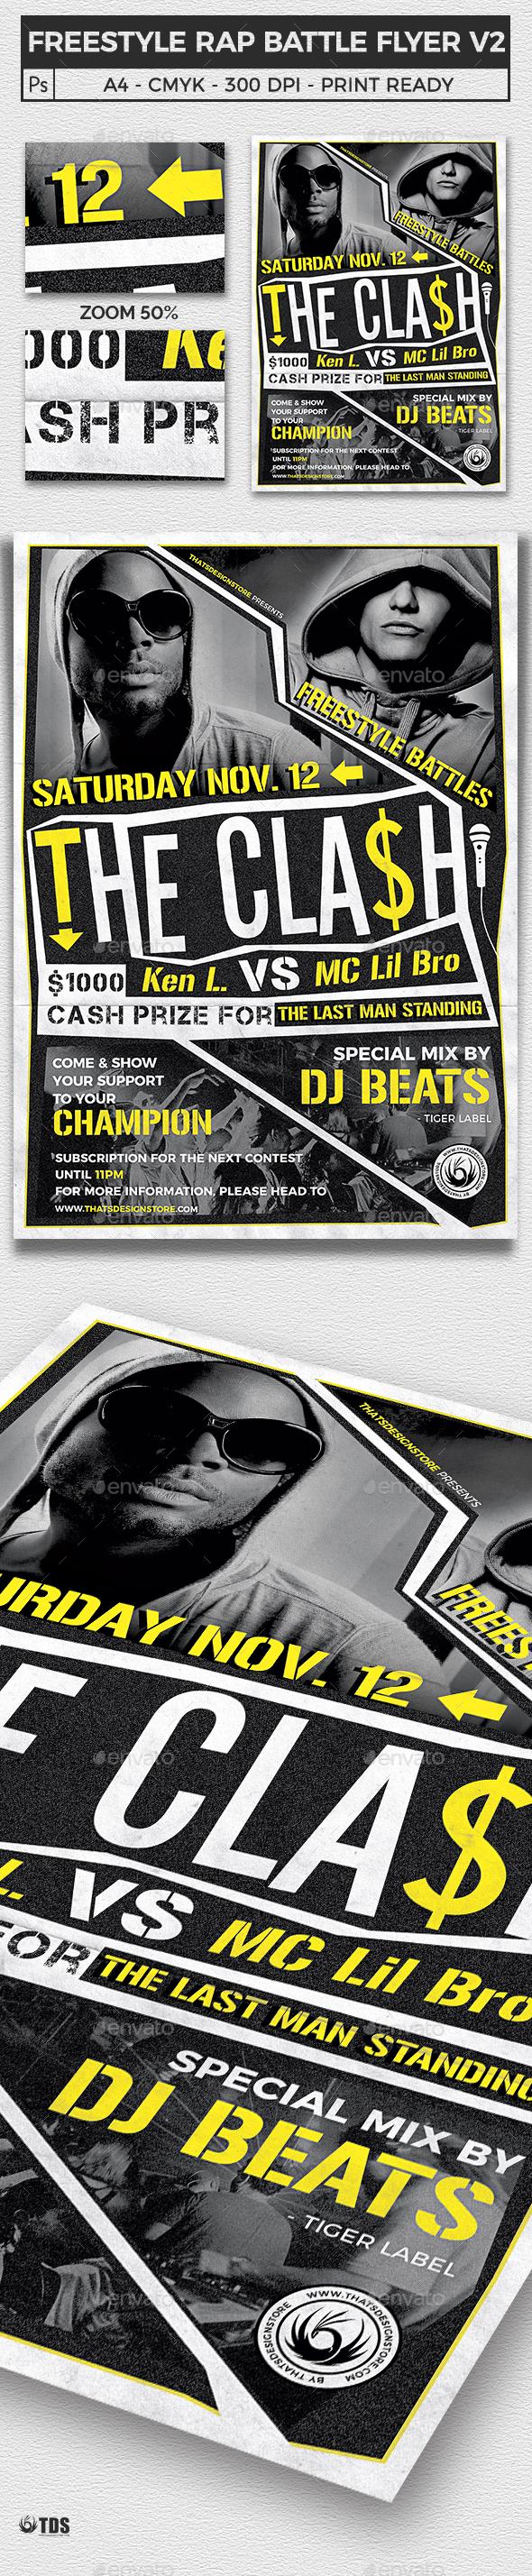 Freestyle Rap Battle Flyer Template V2 - Clubs & Parties Events